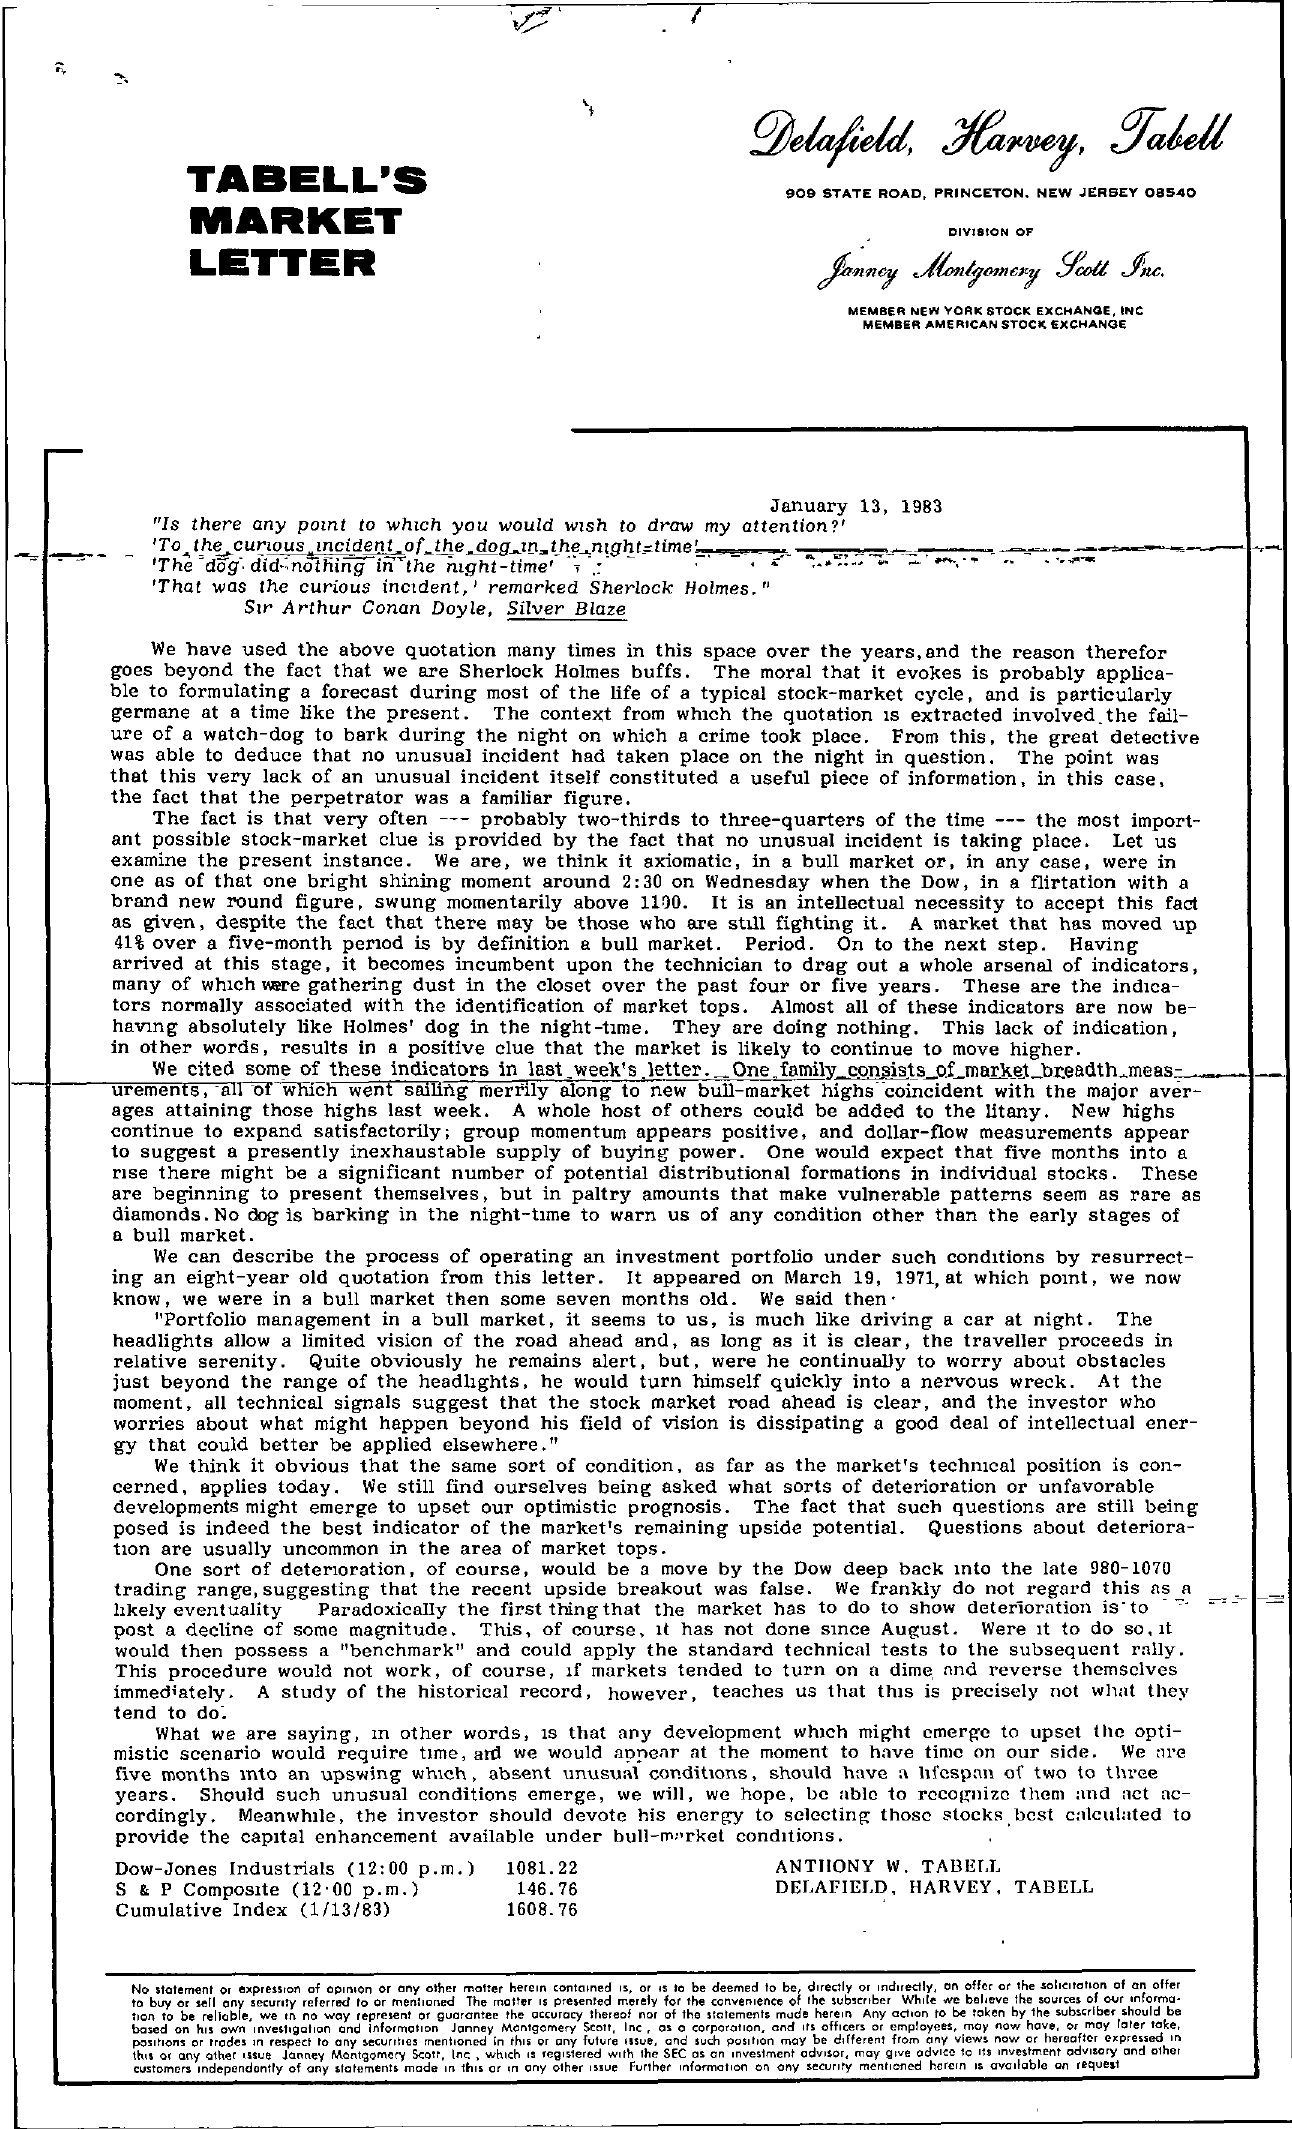 Tabell's Market Letter - January 13, 1983